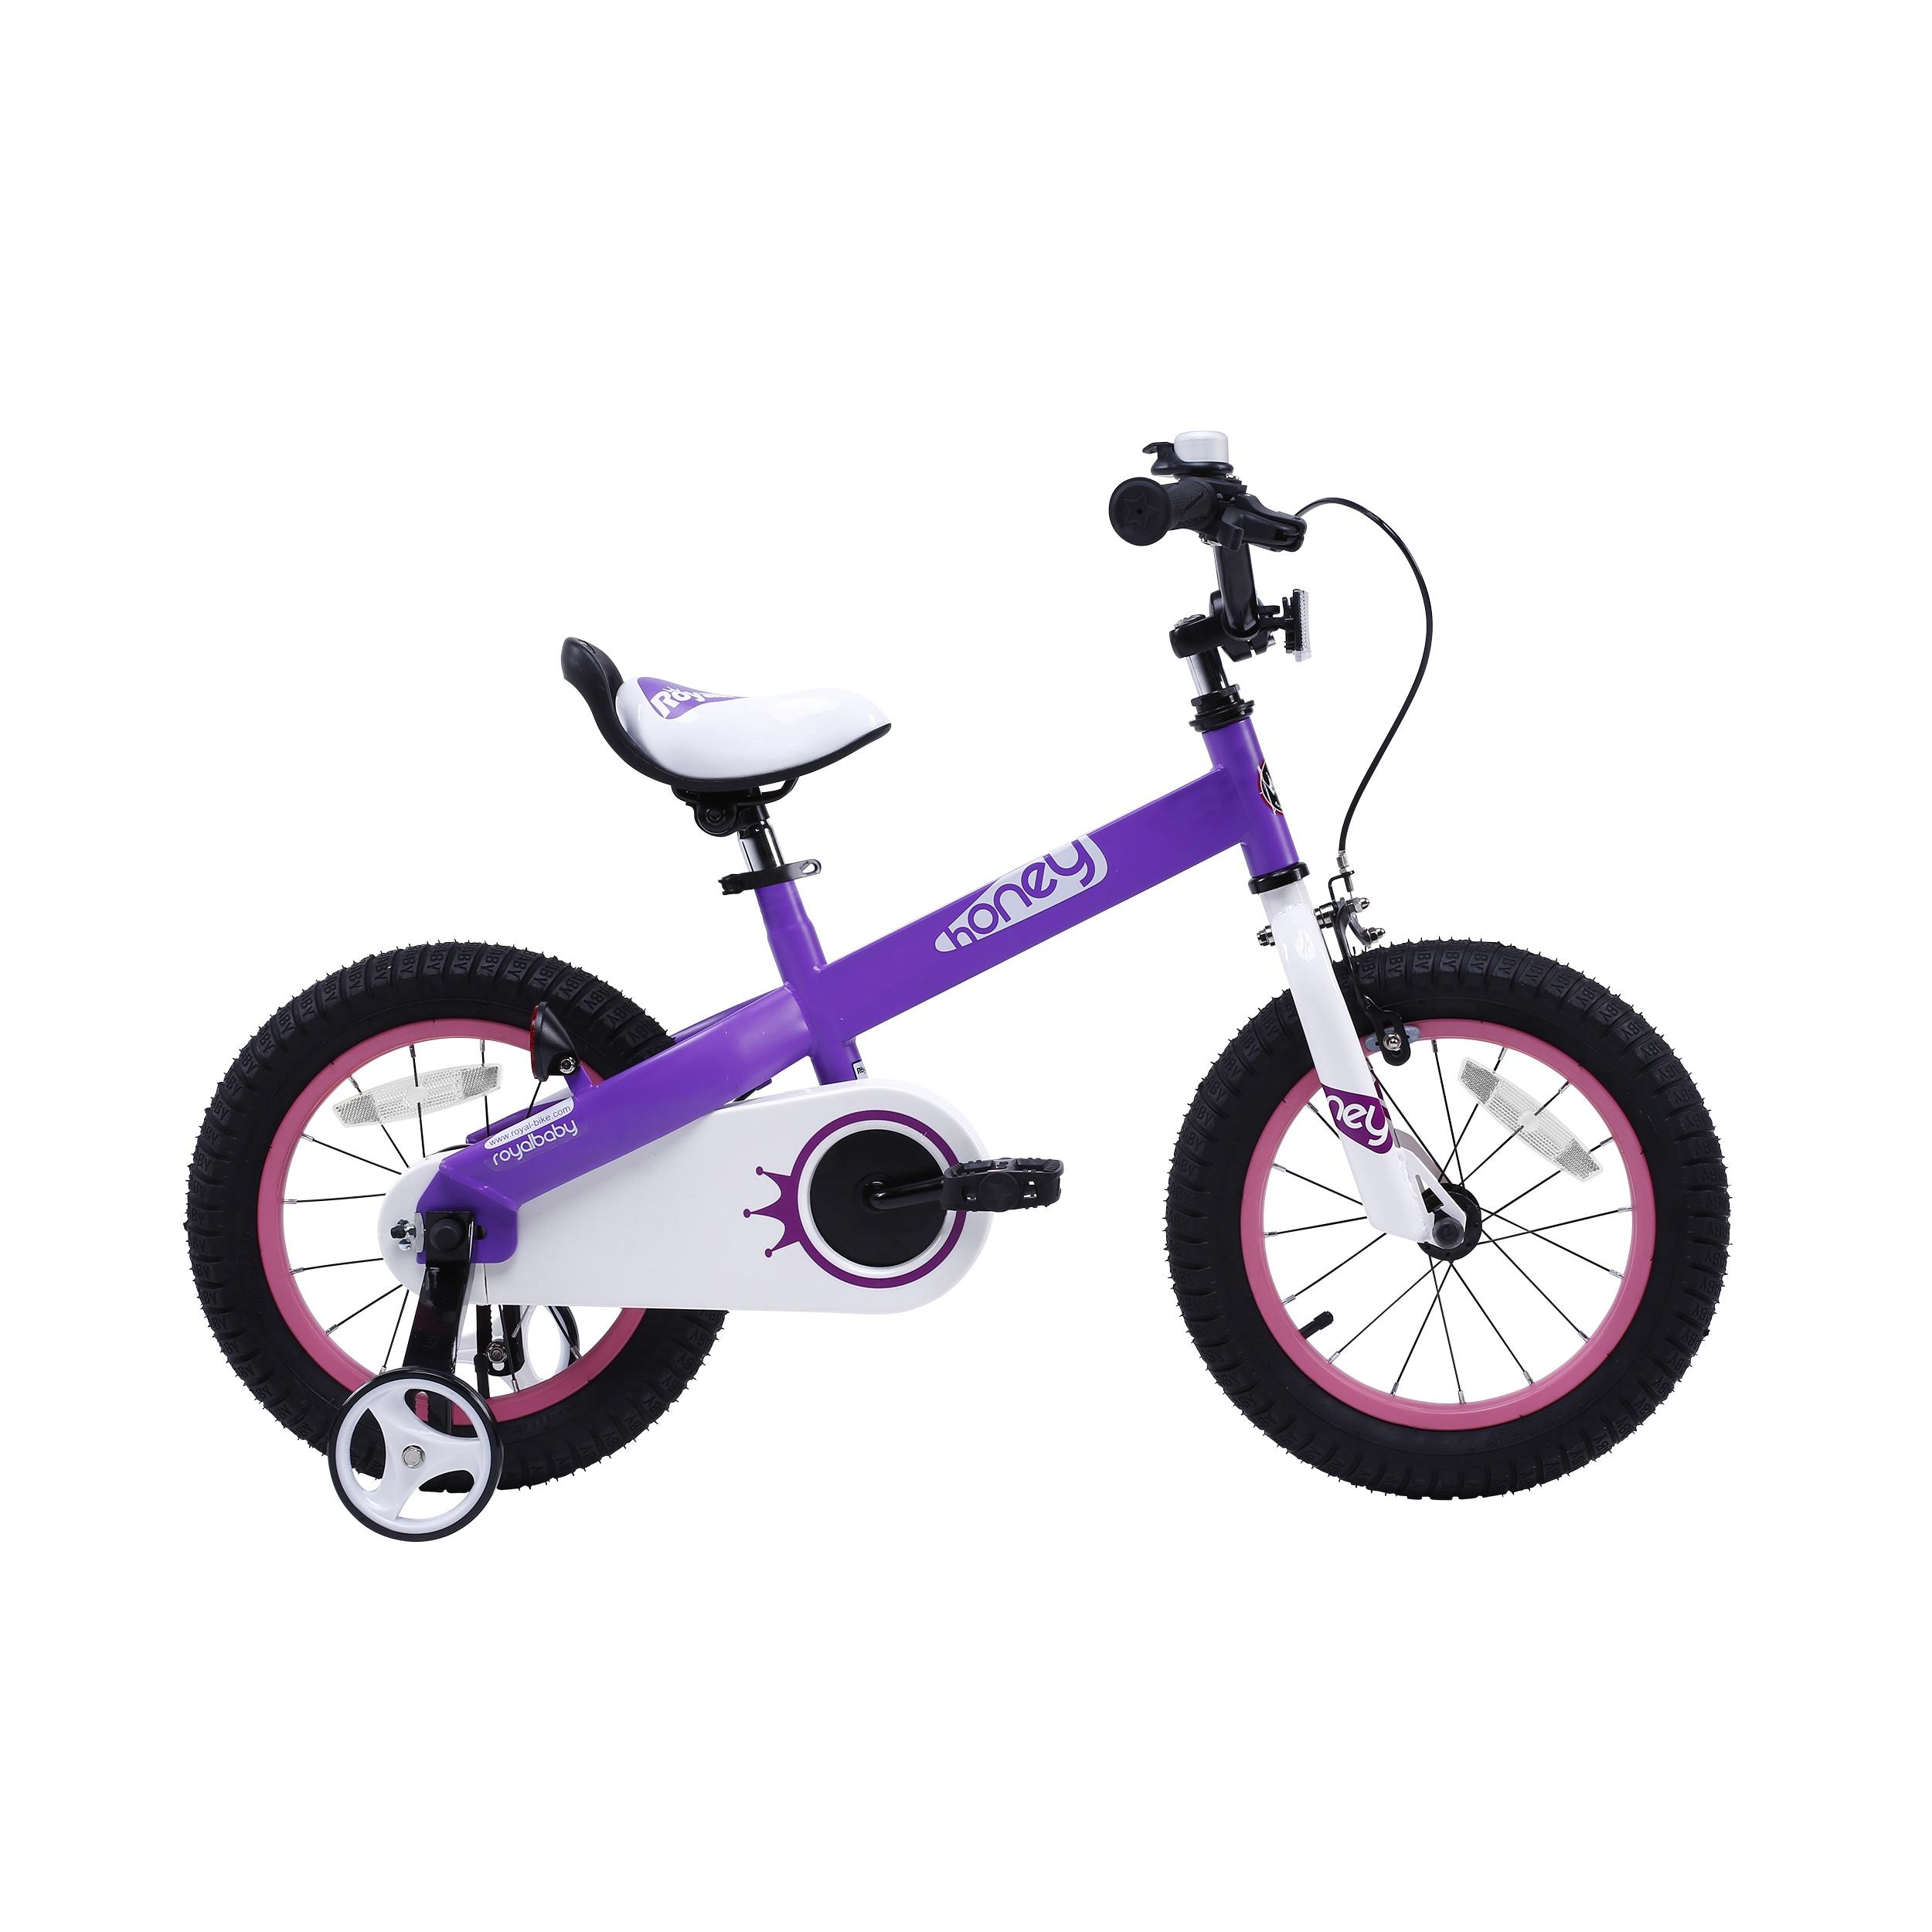 Royalbaby Honey 14 Inch Kids Bike With Training Wheels Free Shipping Today Com 10695247